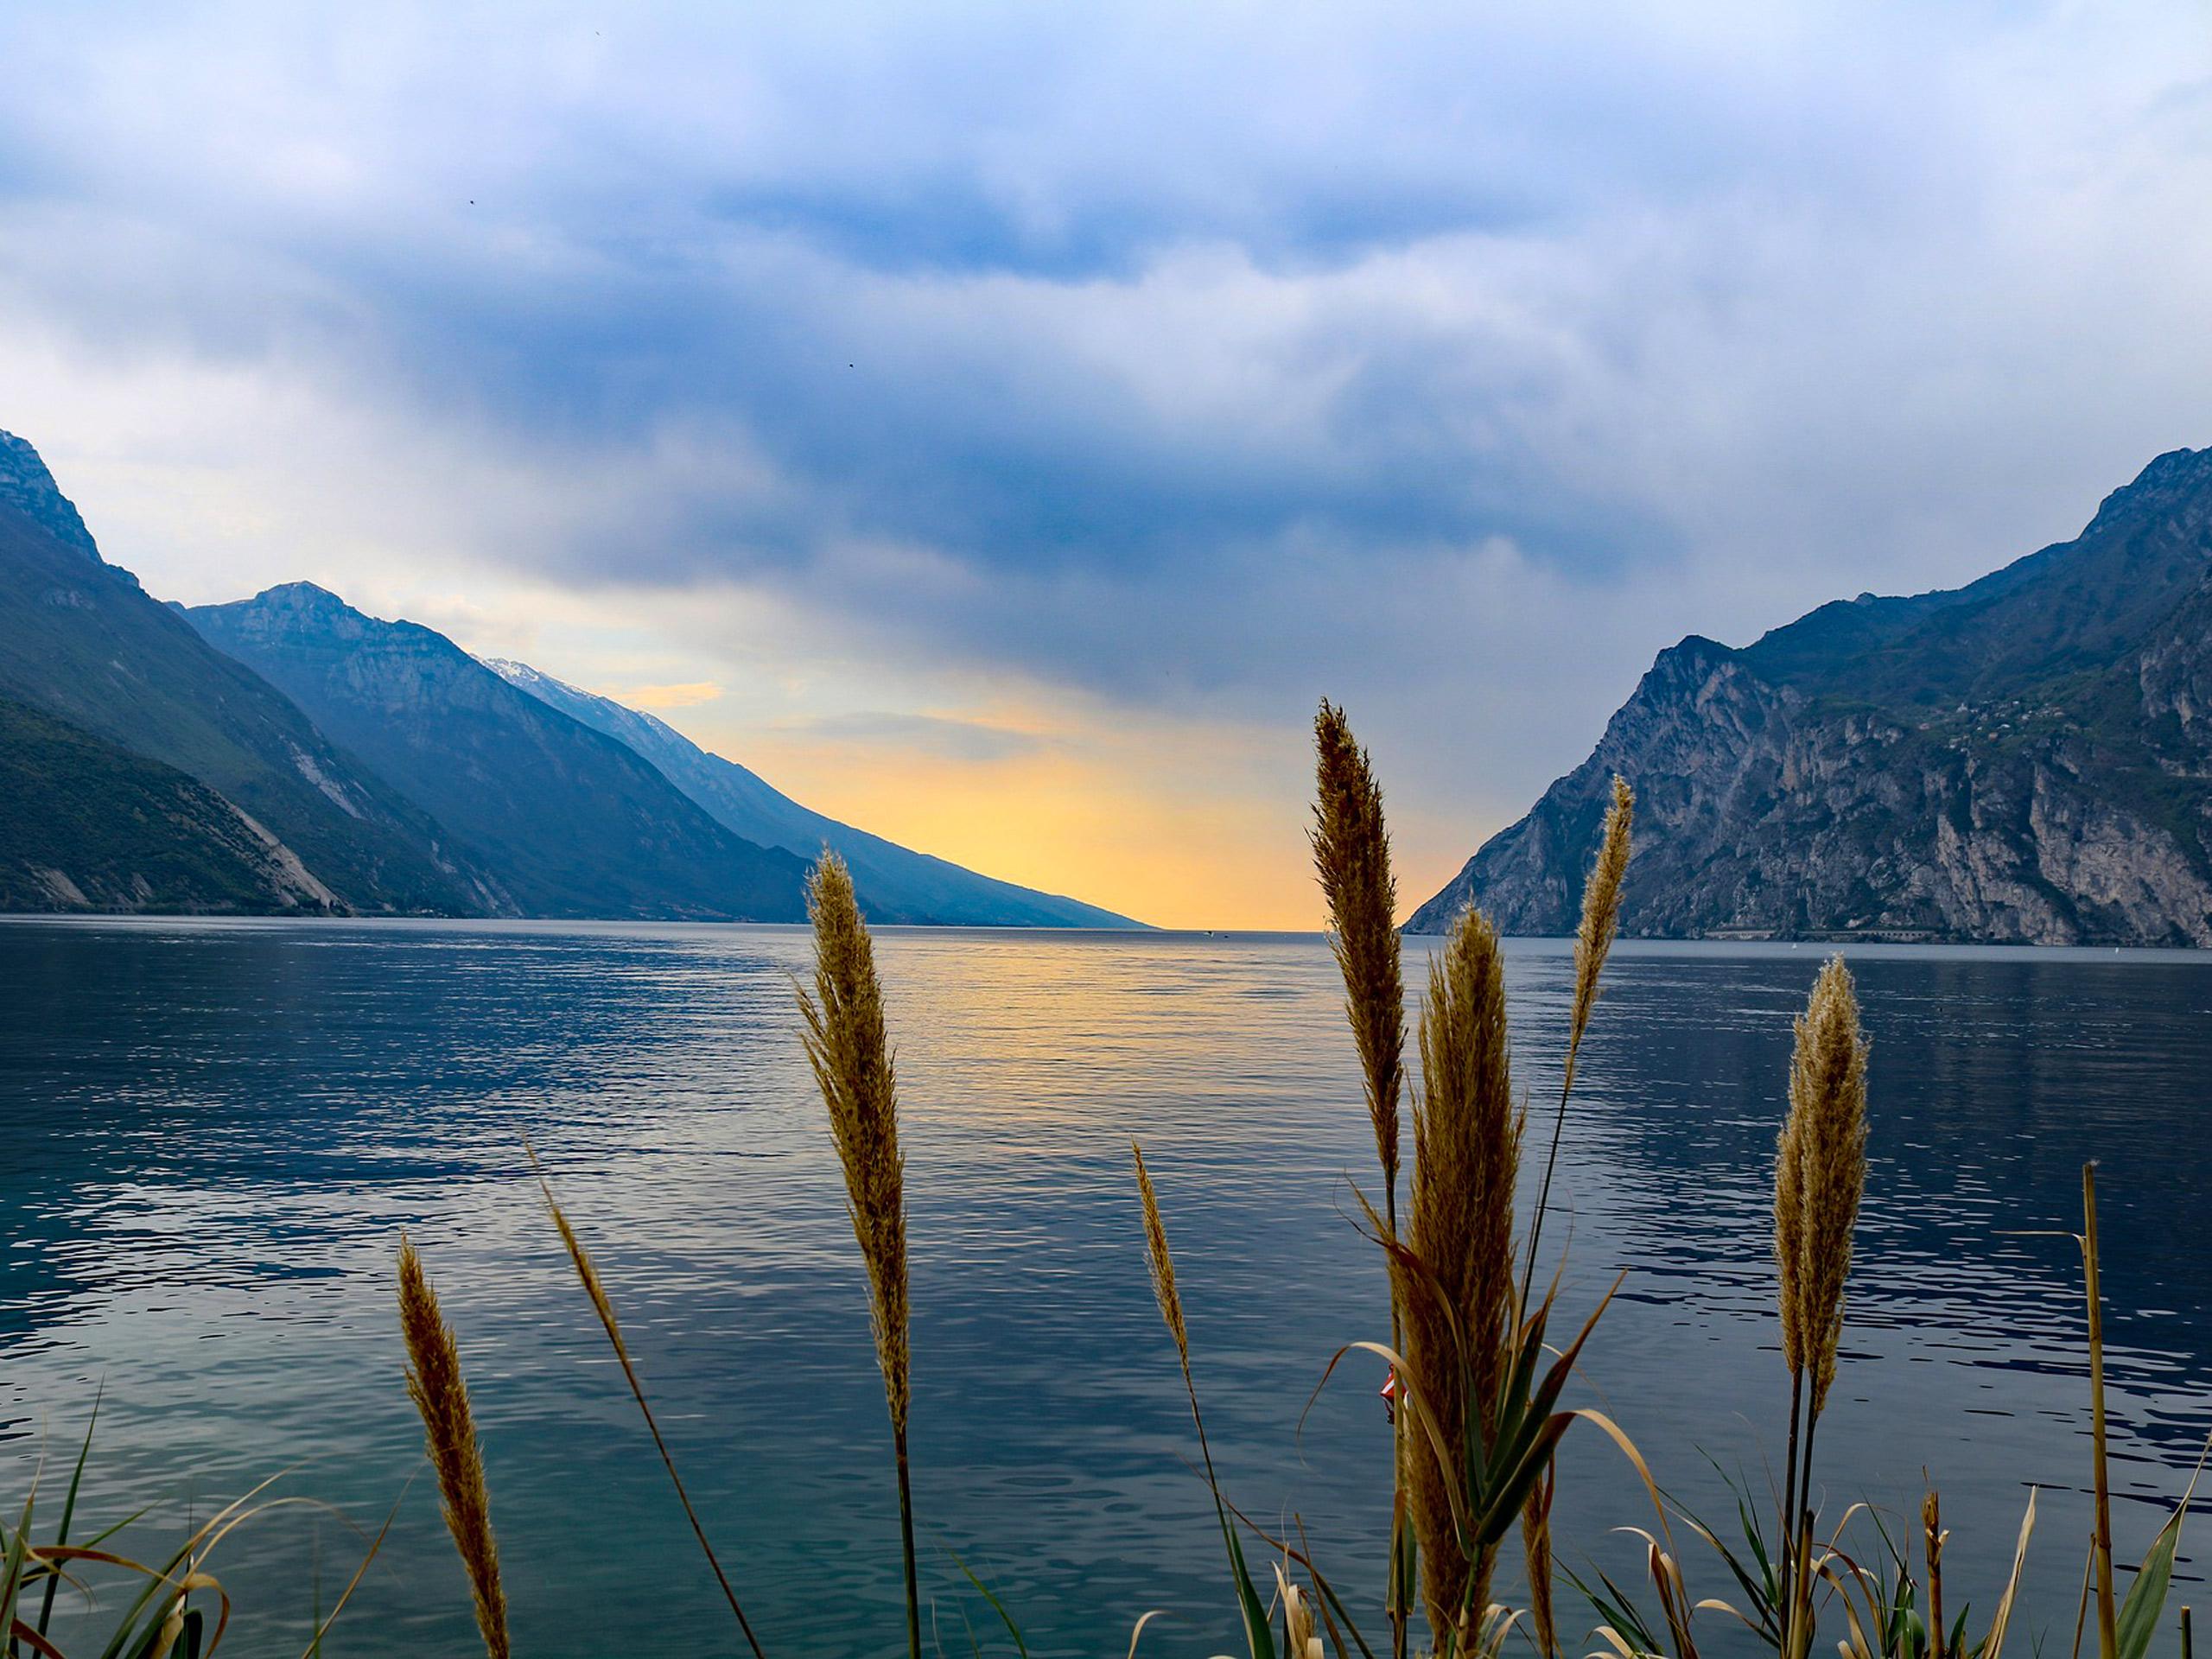 Sunrise on the Lake Garda